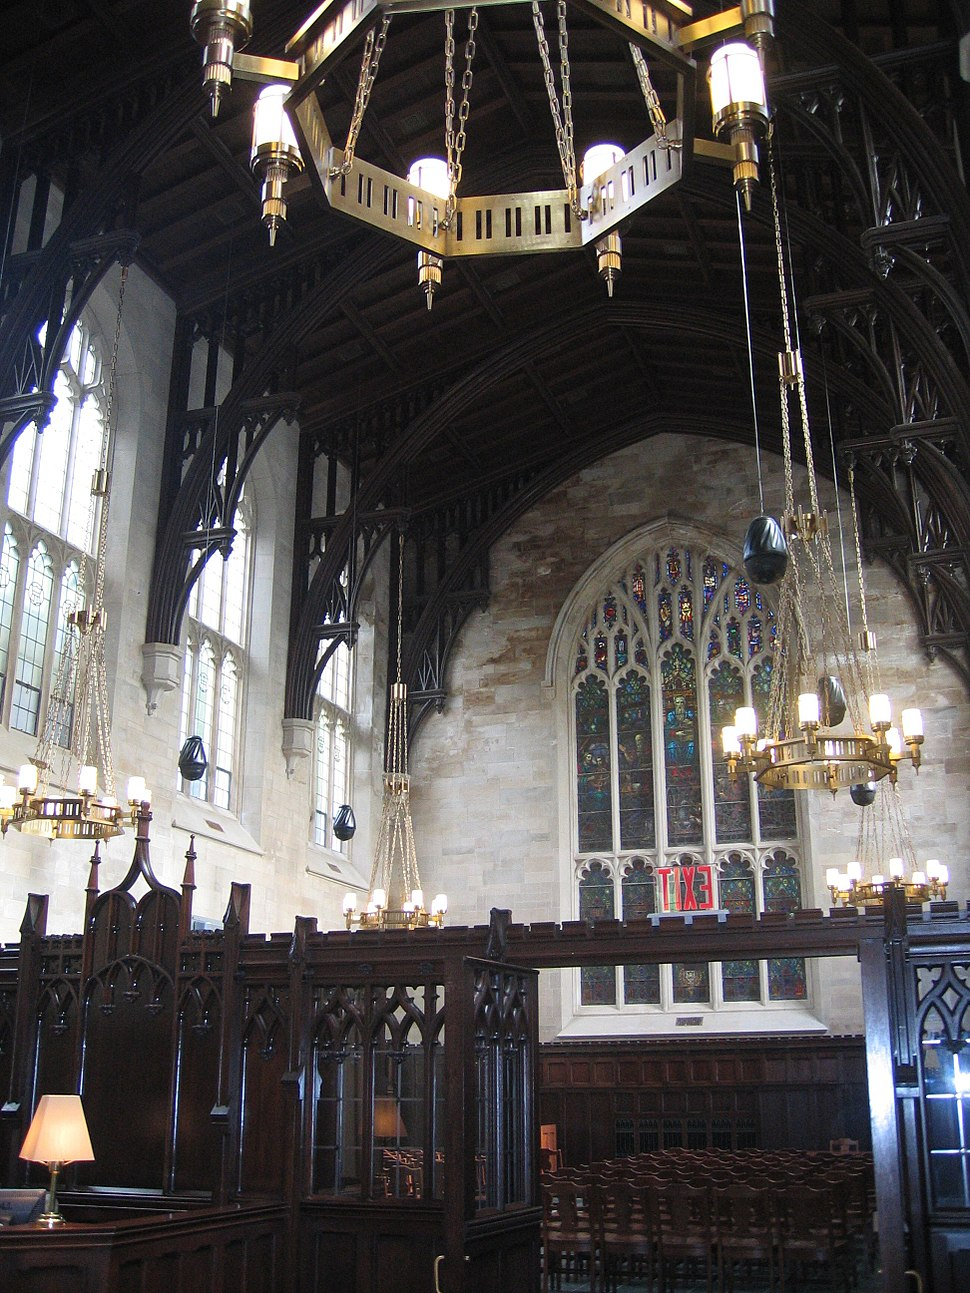 Duane Library interior